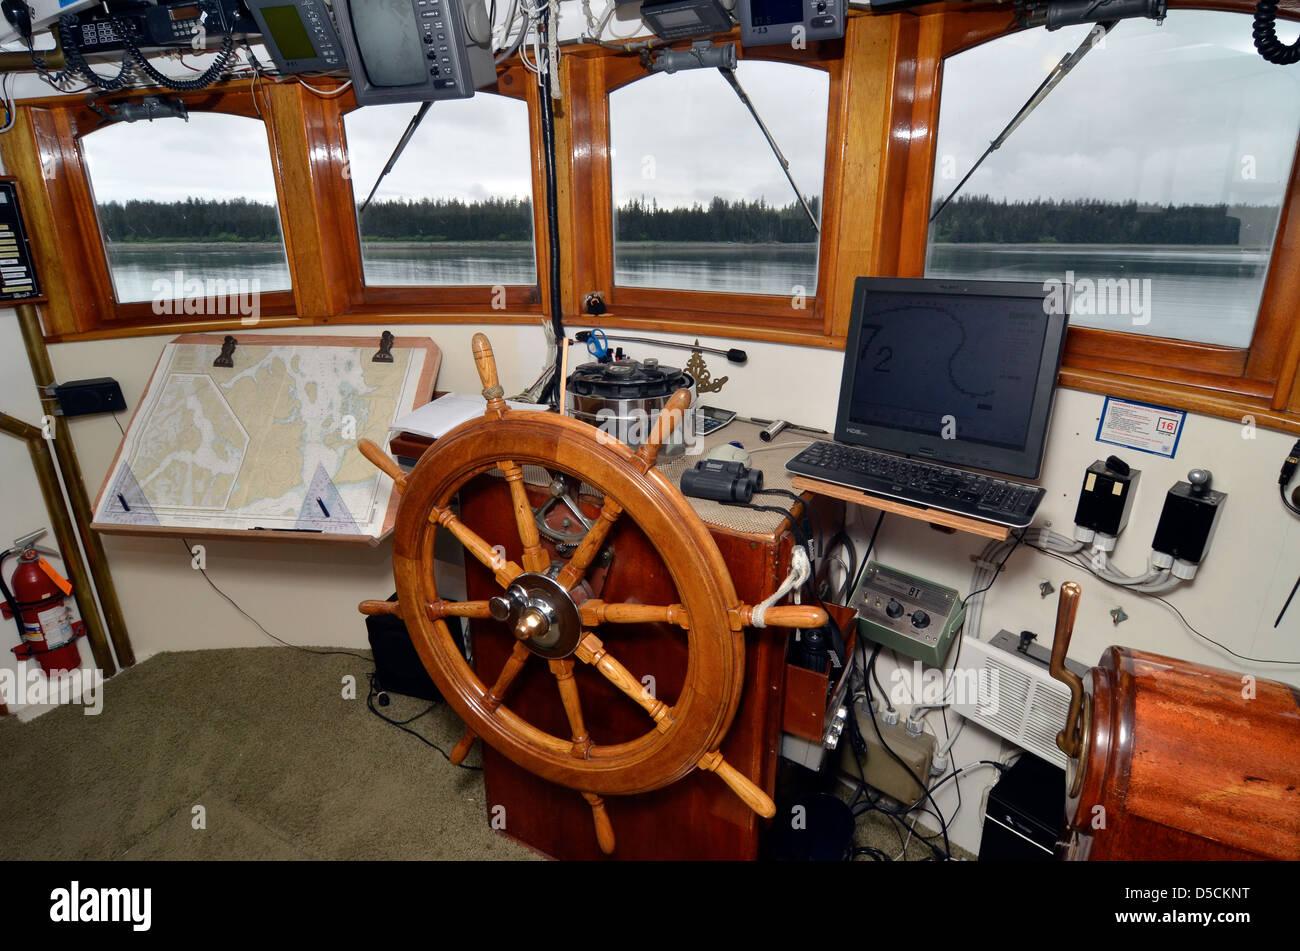 Wheelhouse of a small tour boat in Glacier Bay, Alaska. - Stock Image